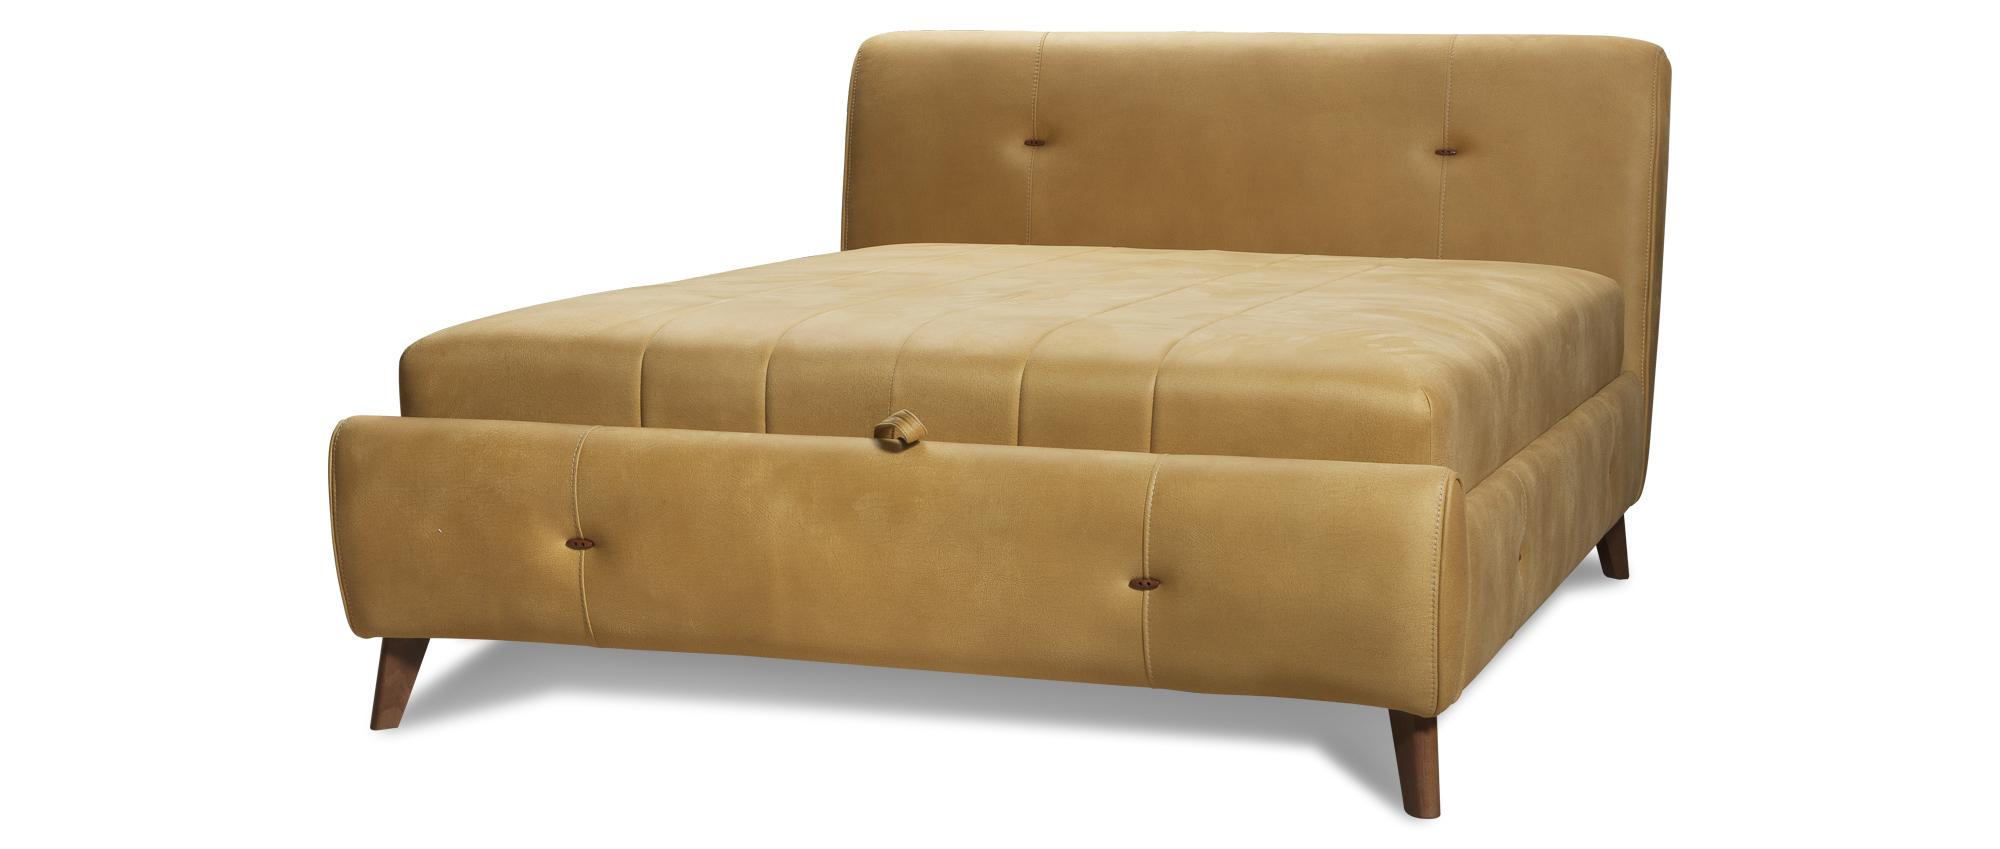 Bračni krevet Doris